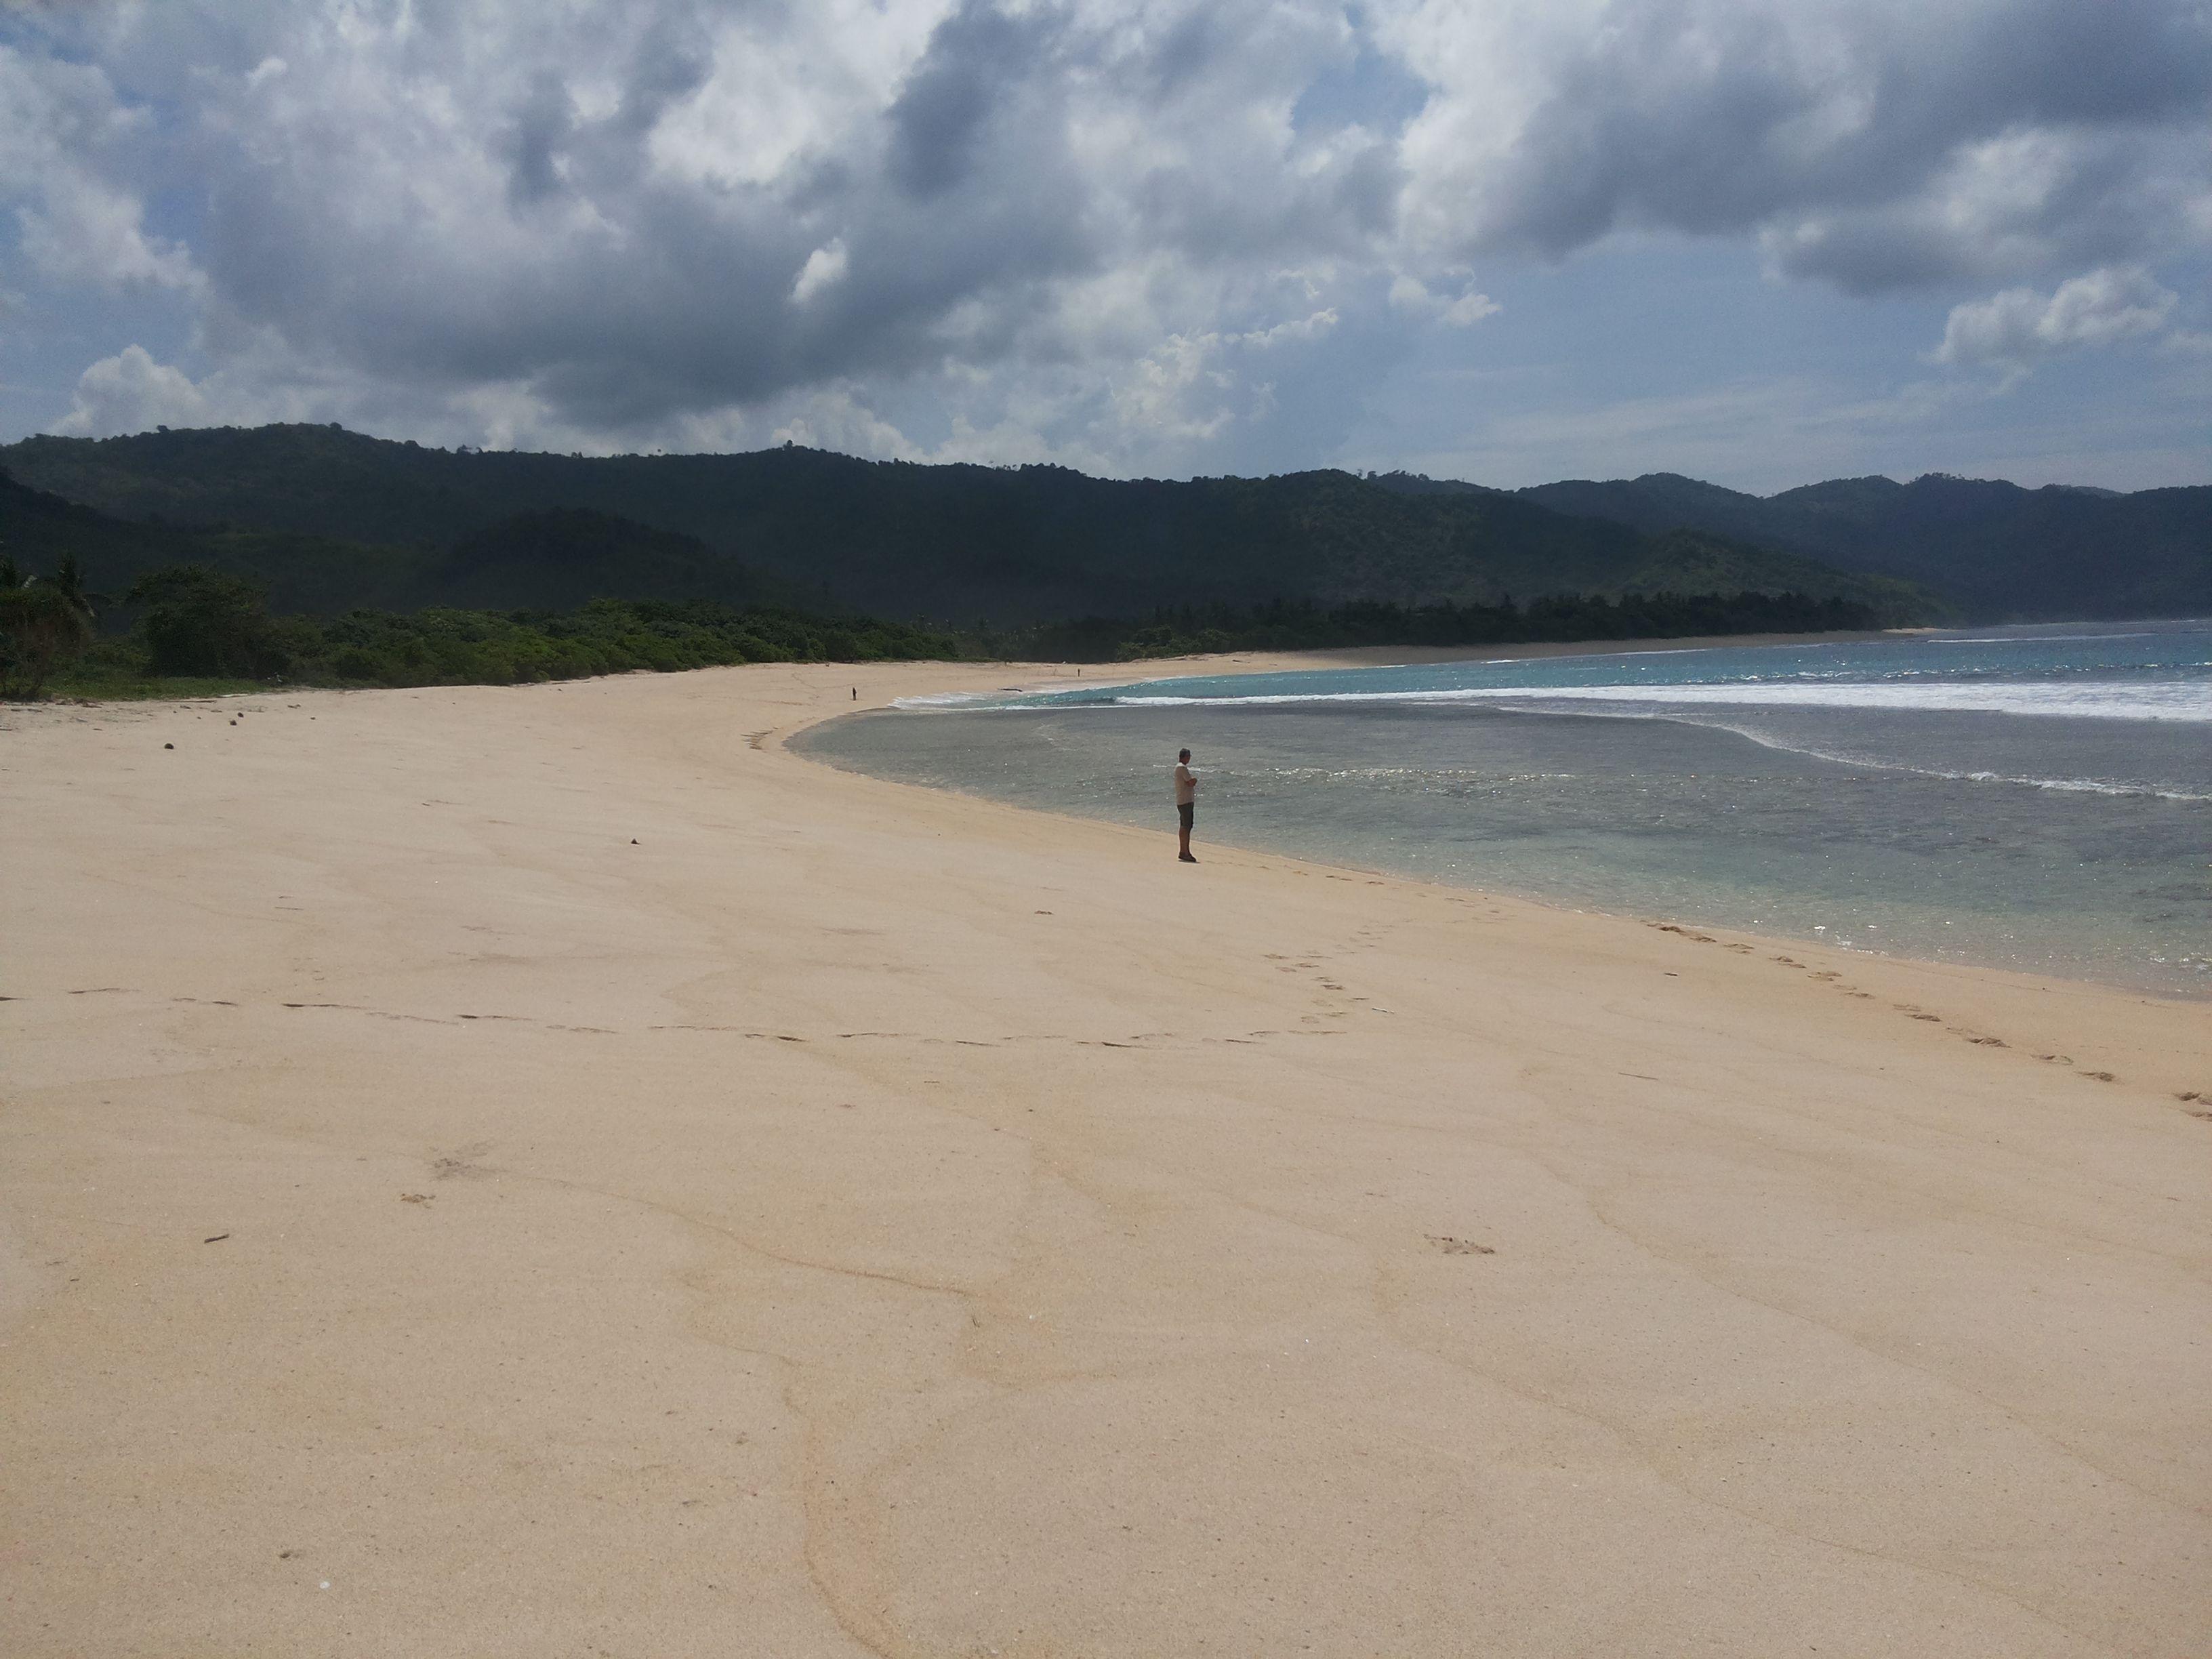 Sekotong Tour Www Bookinglombokholidays Gili Kedis Called Honeymoon Island Islands